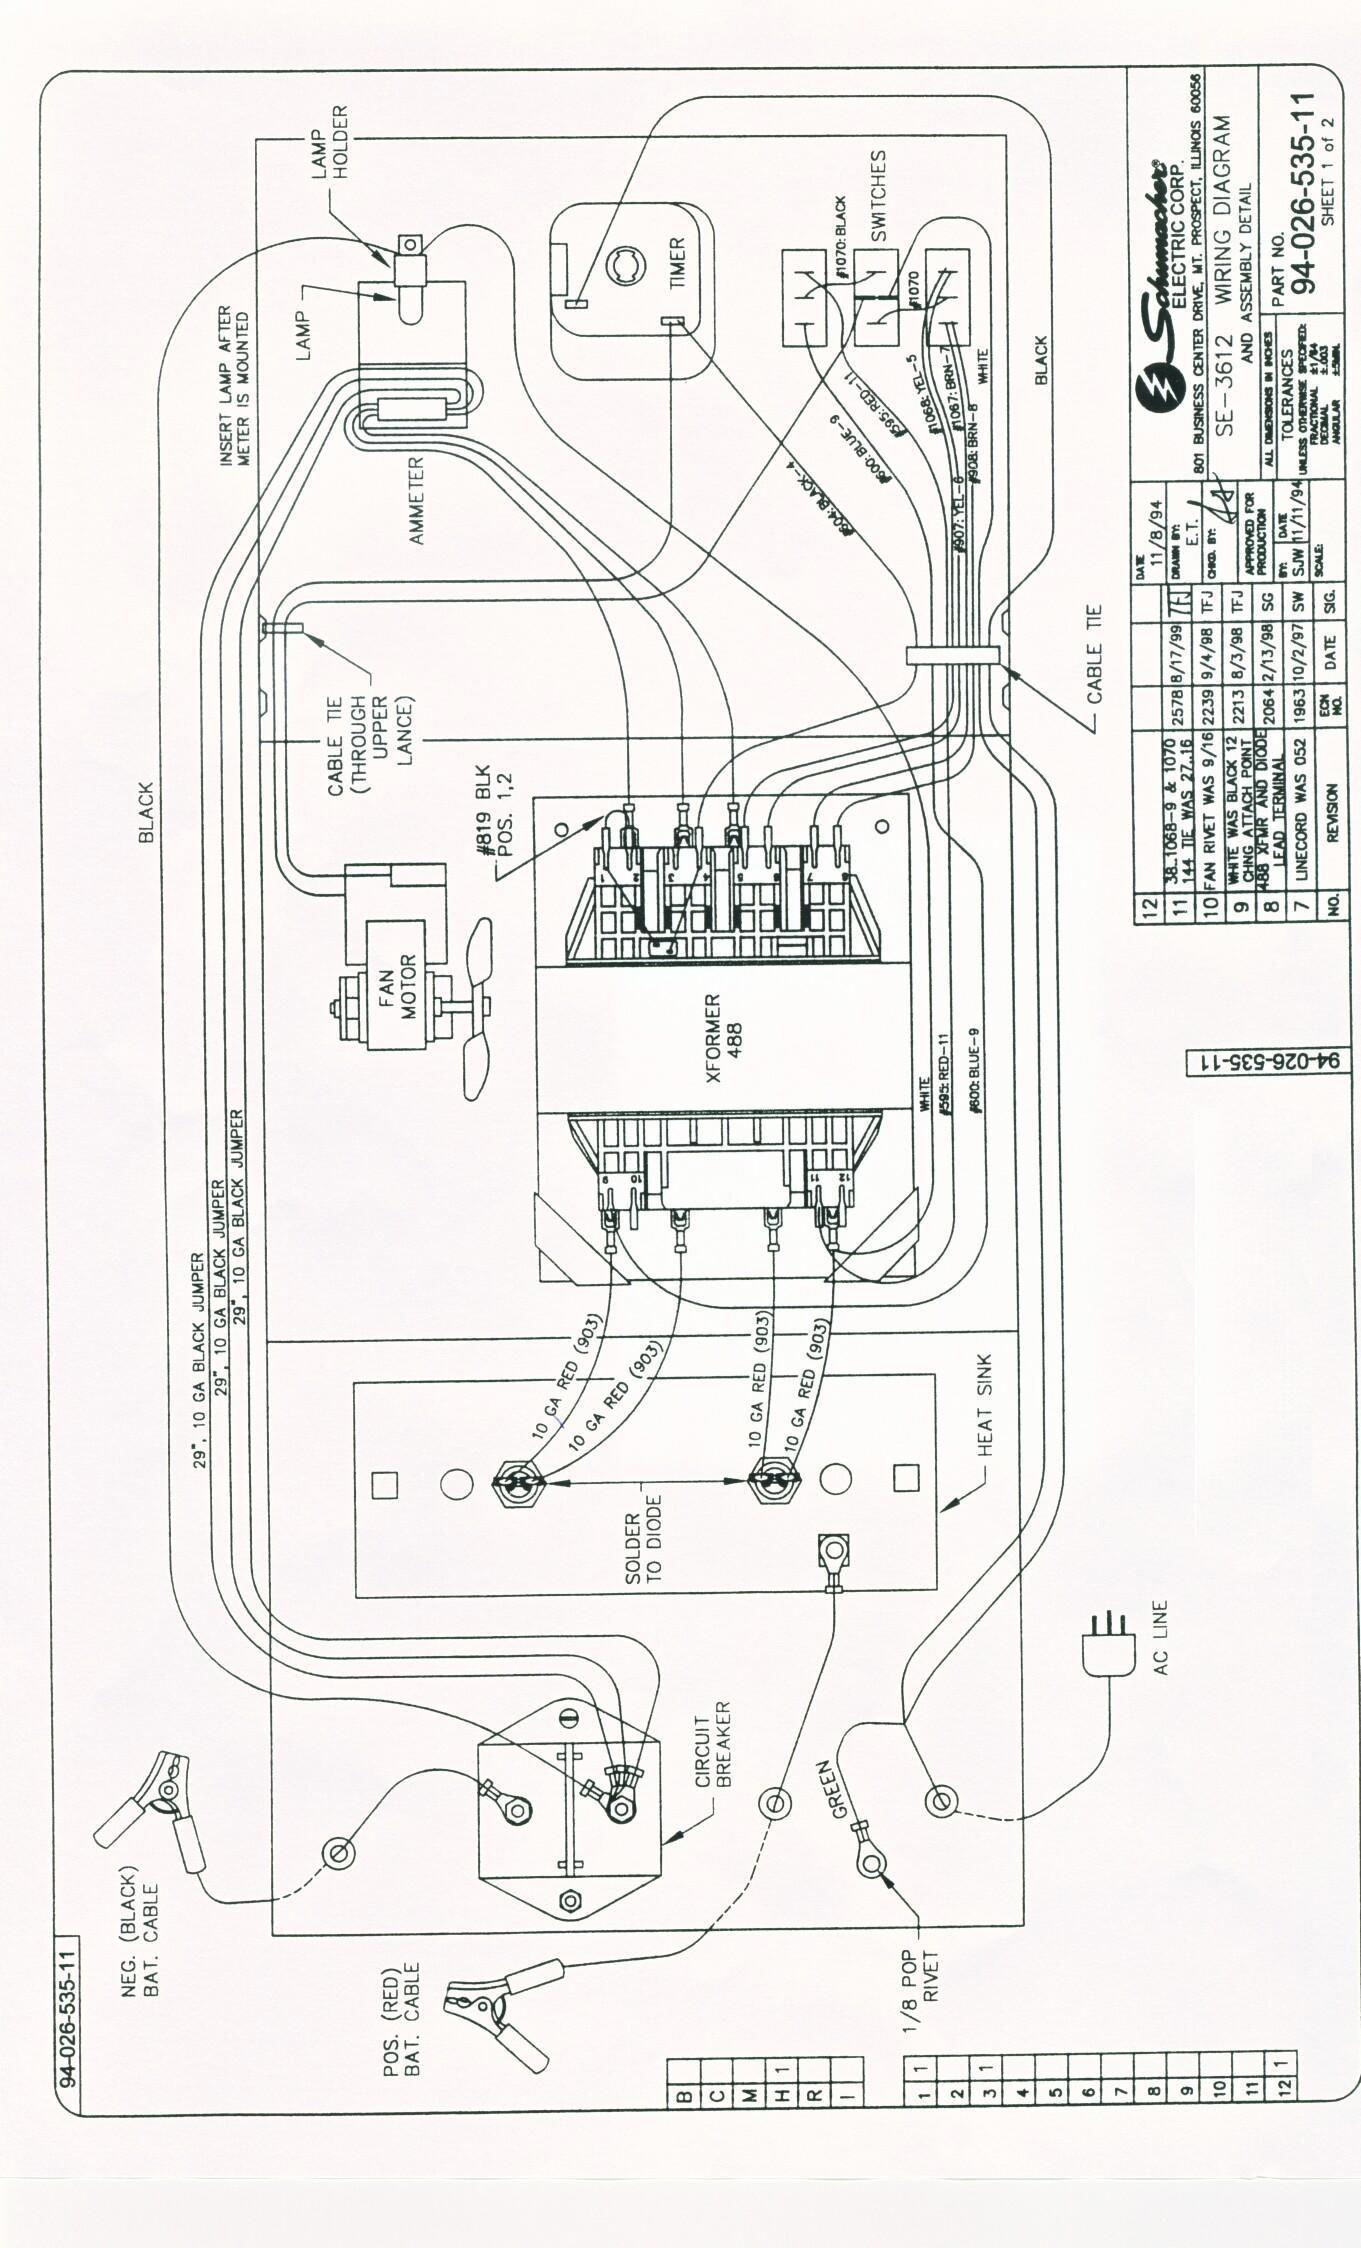 schumacher battery charger wiring schematic 0 car battery motors wiring diagram iphone 6 schematics schumacher battery charger wiring [ 1361 x 2248 Pixel ]